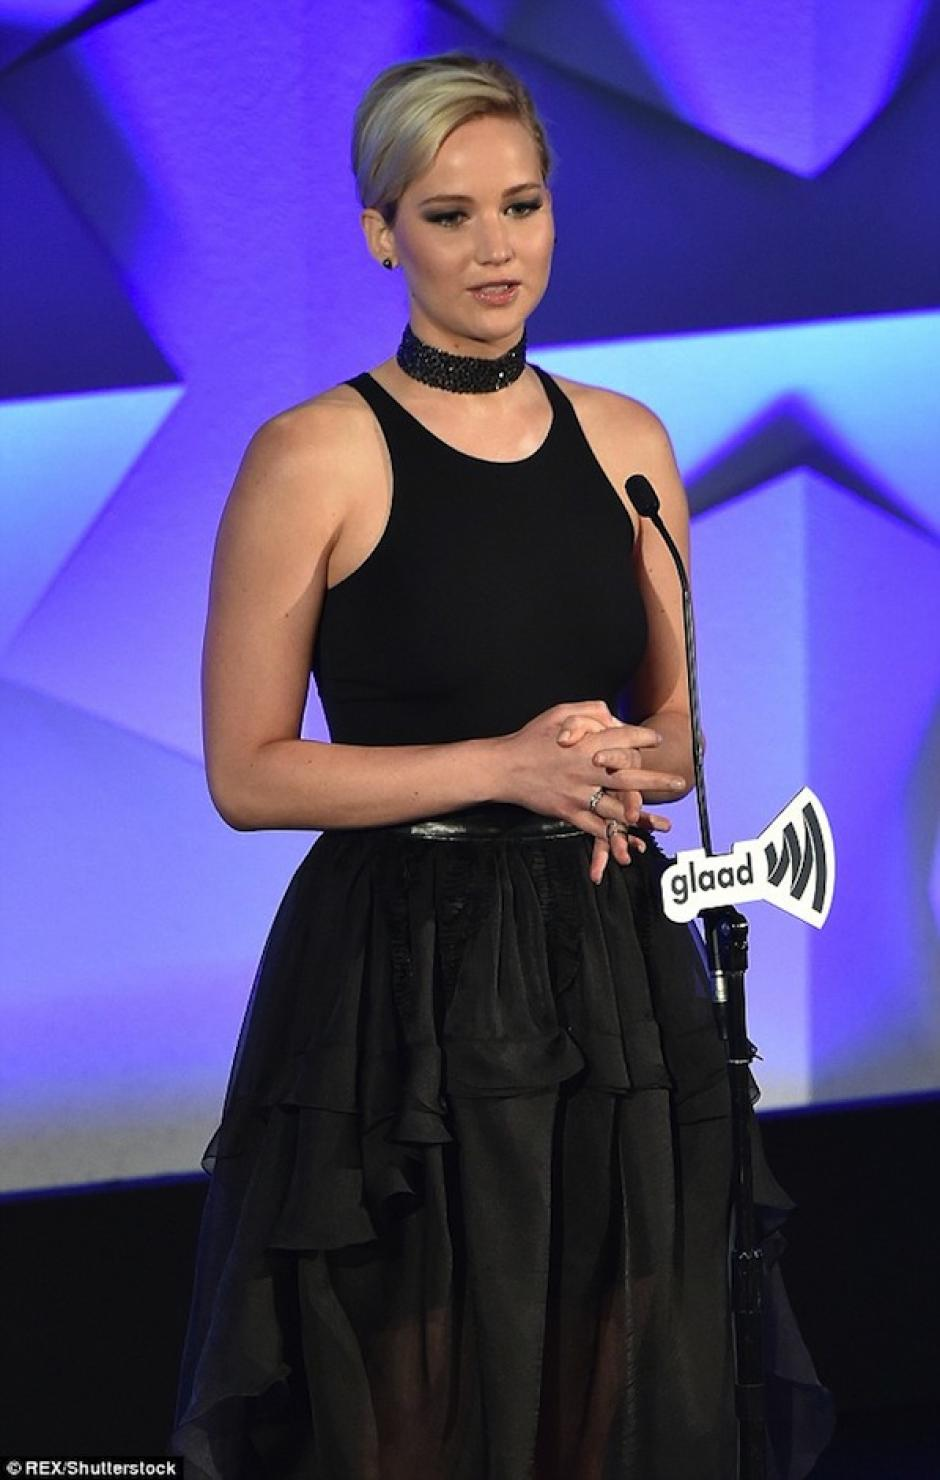 Jennifer dio su discurso. (Foto: Mail Online)